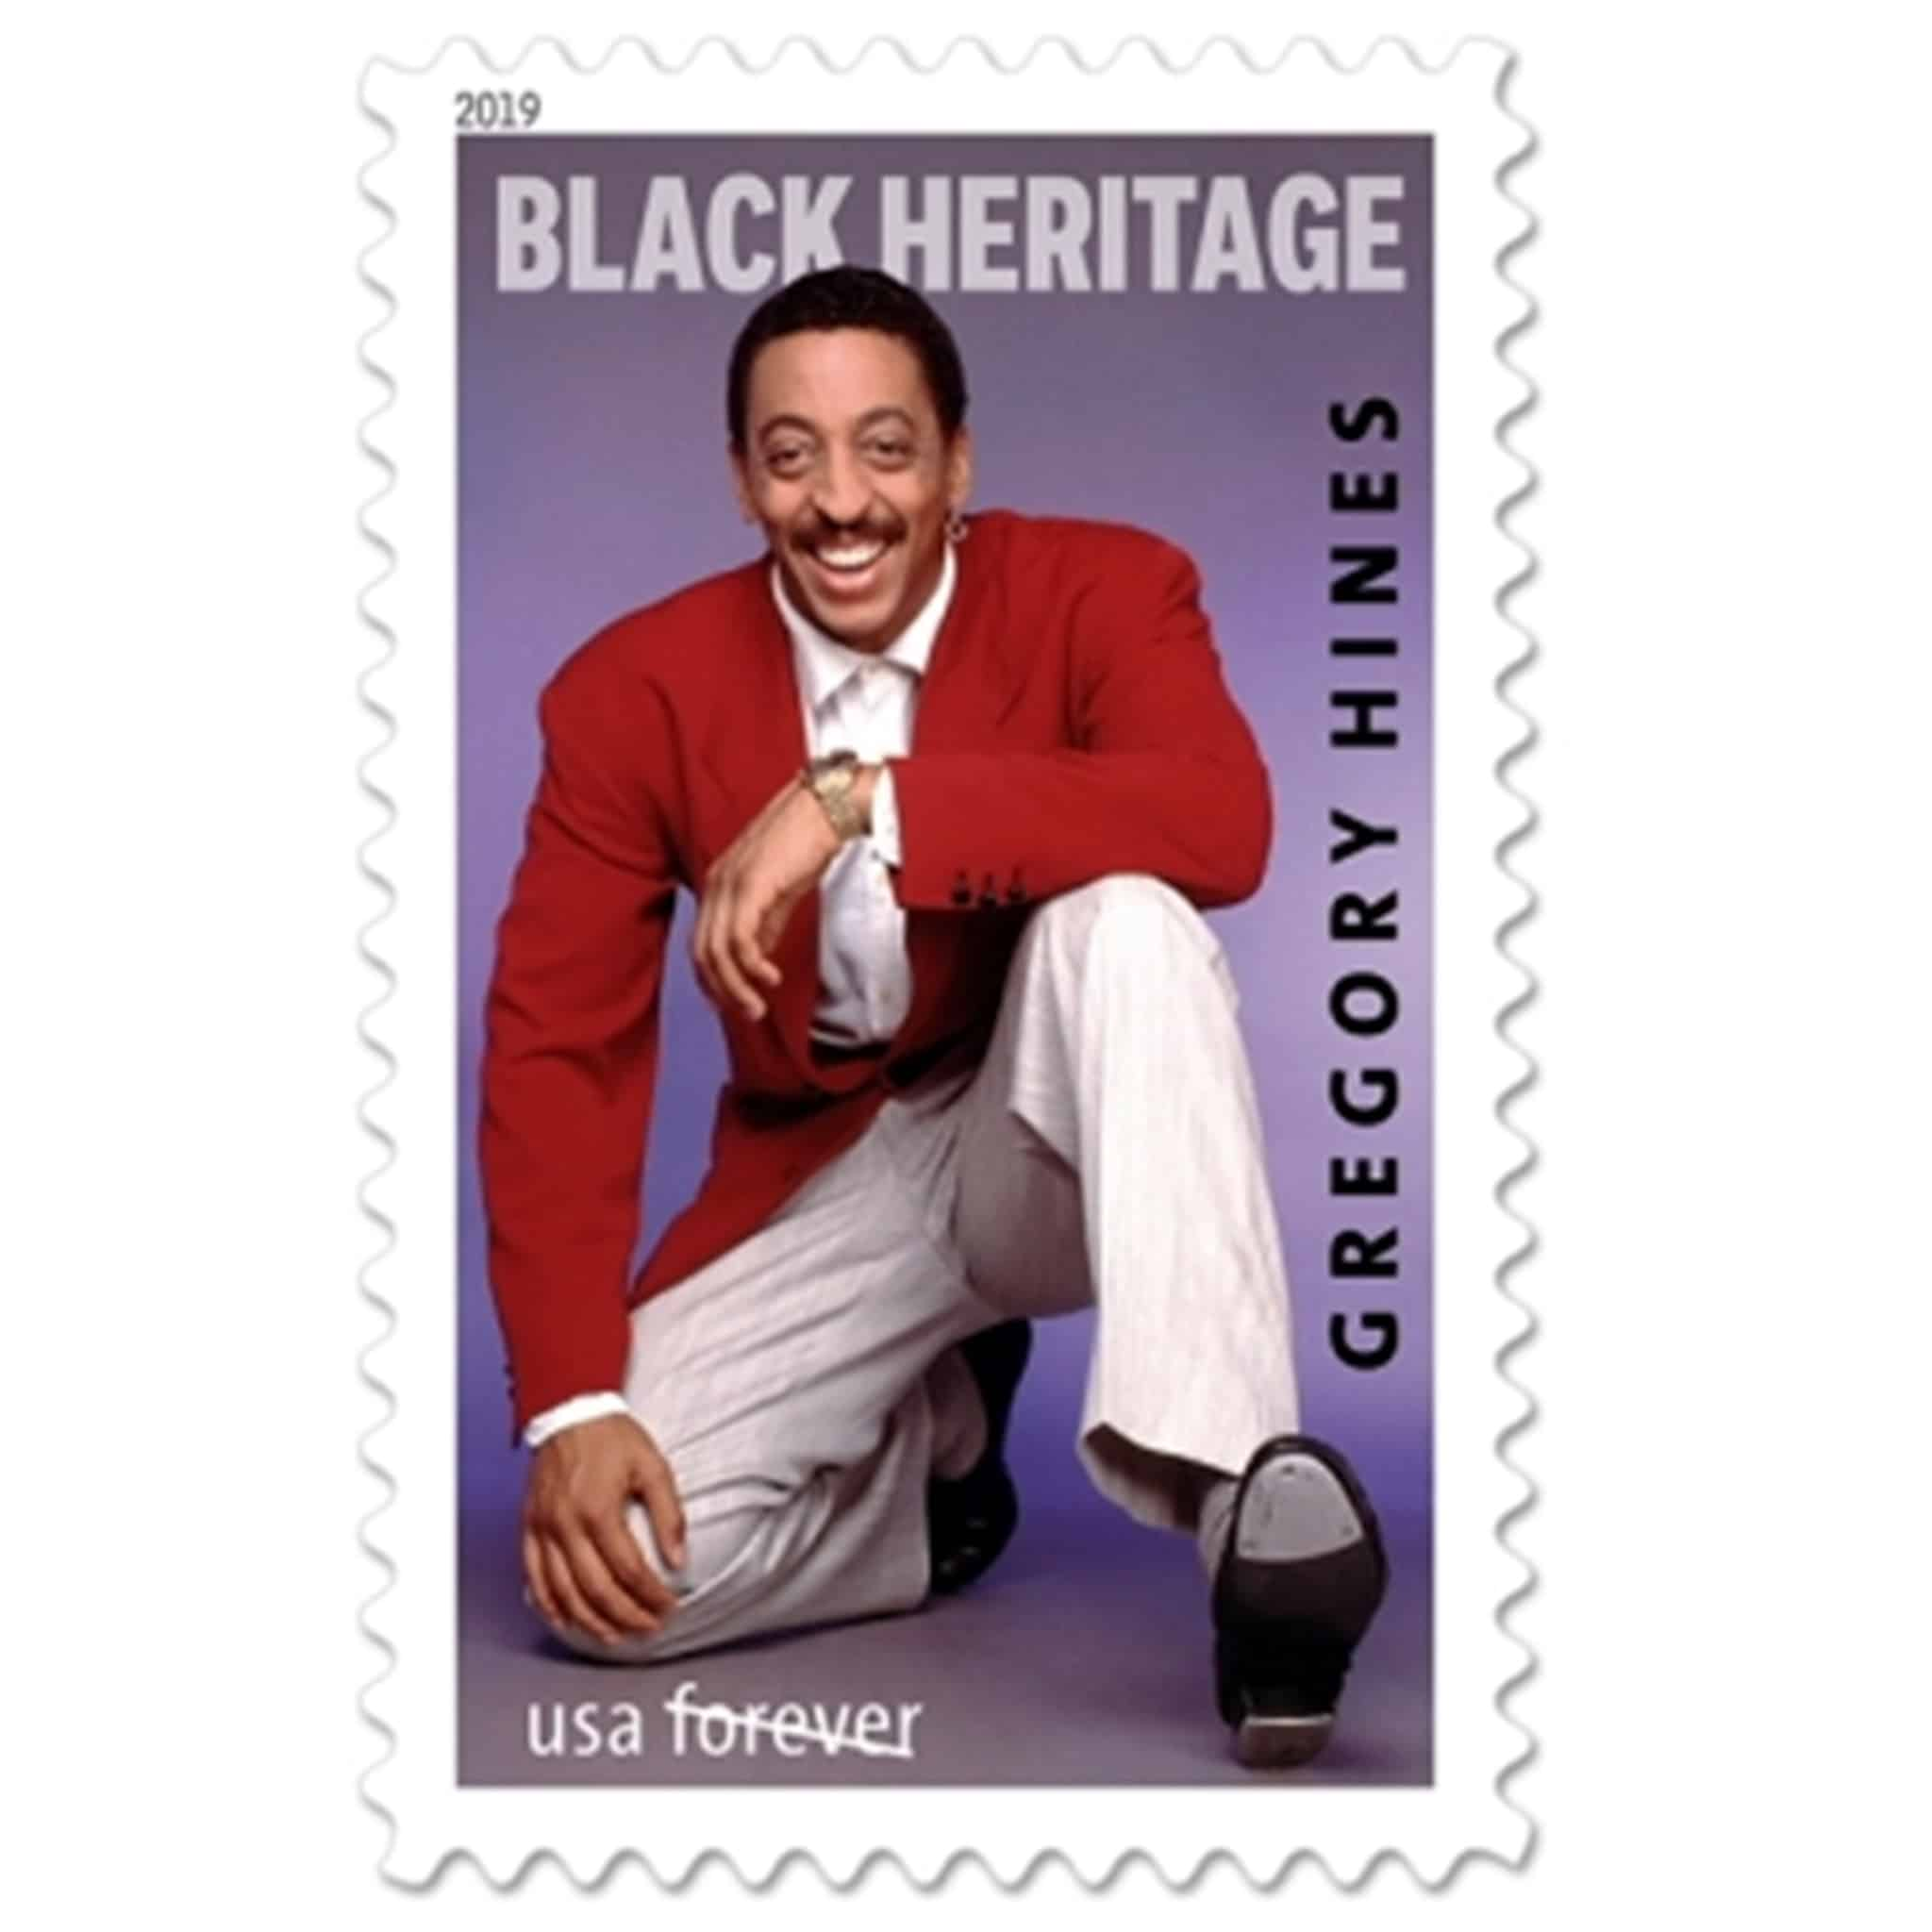 Celebrating Gregory Hines Forever 2019 Stamp